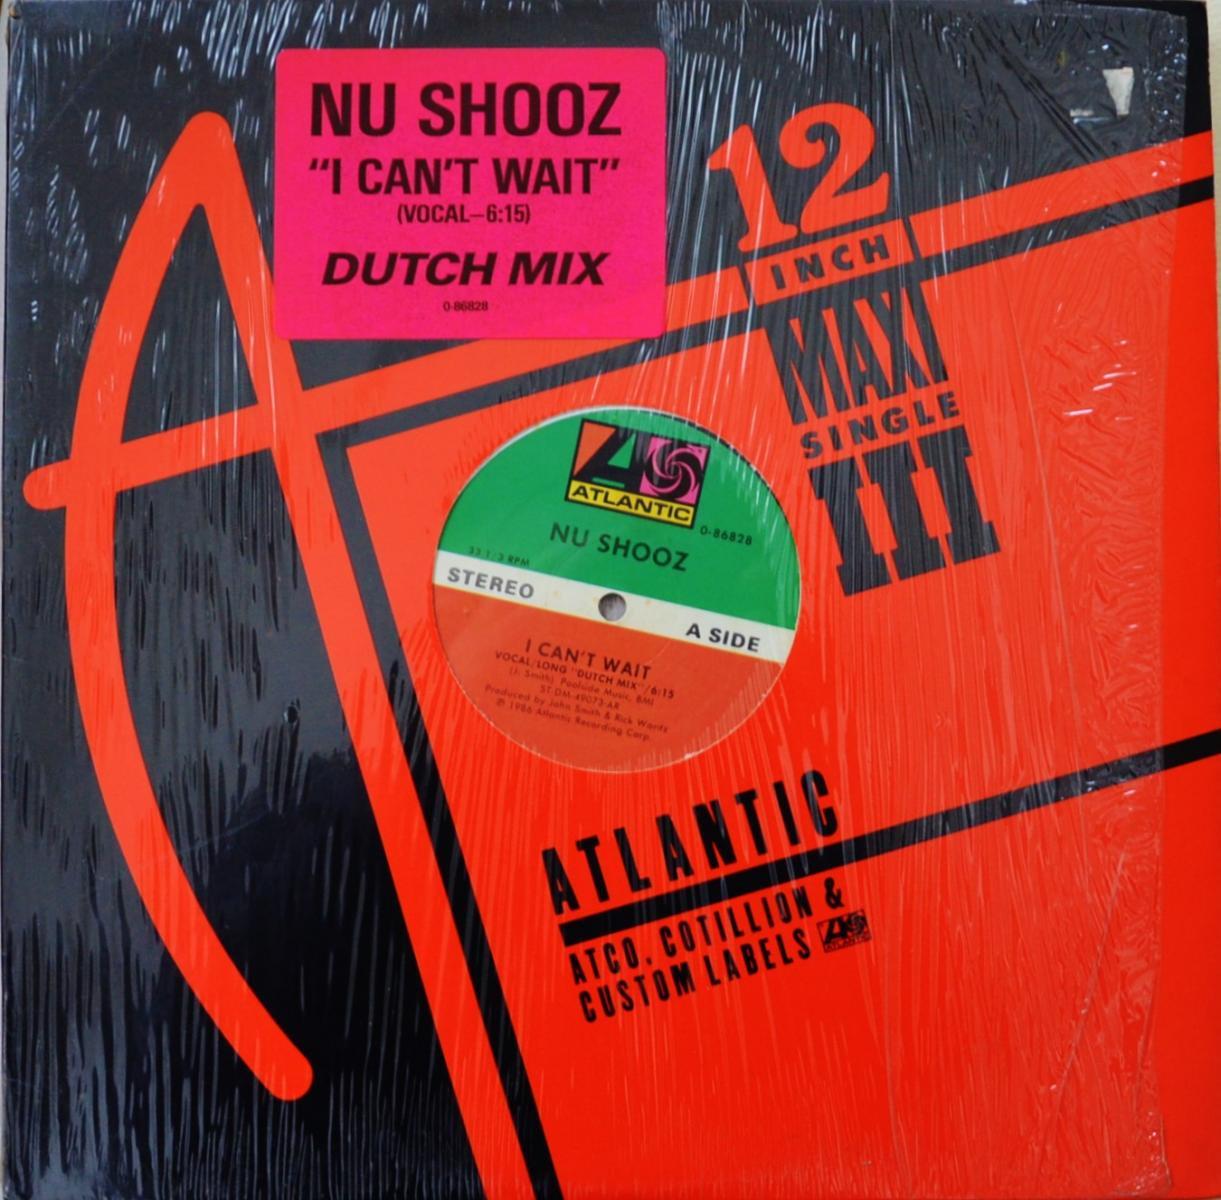 NU SHOOZ / I CAN'T WAIT / DON'T TURN BACK (12